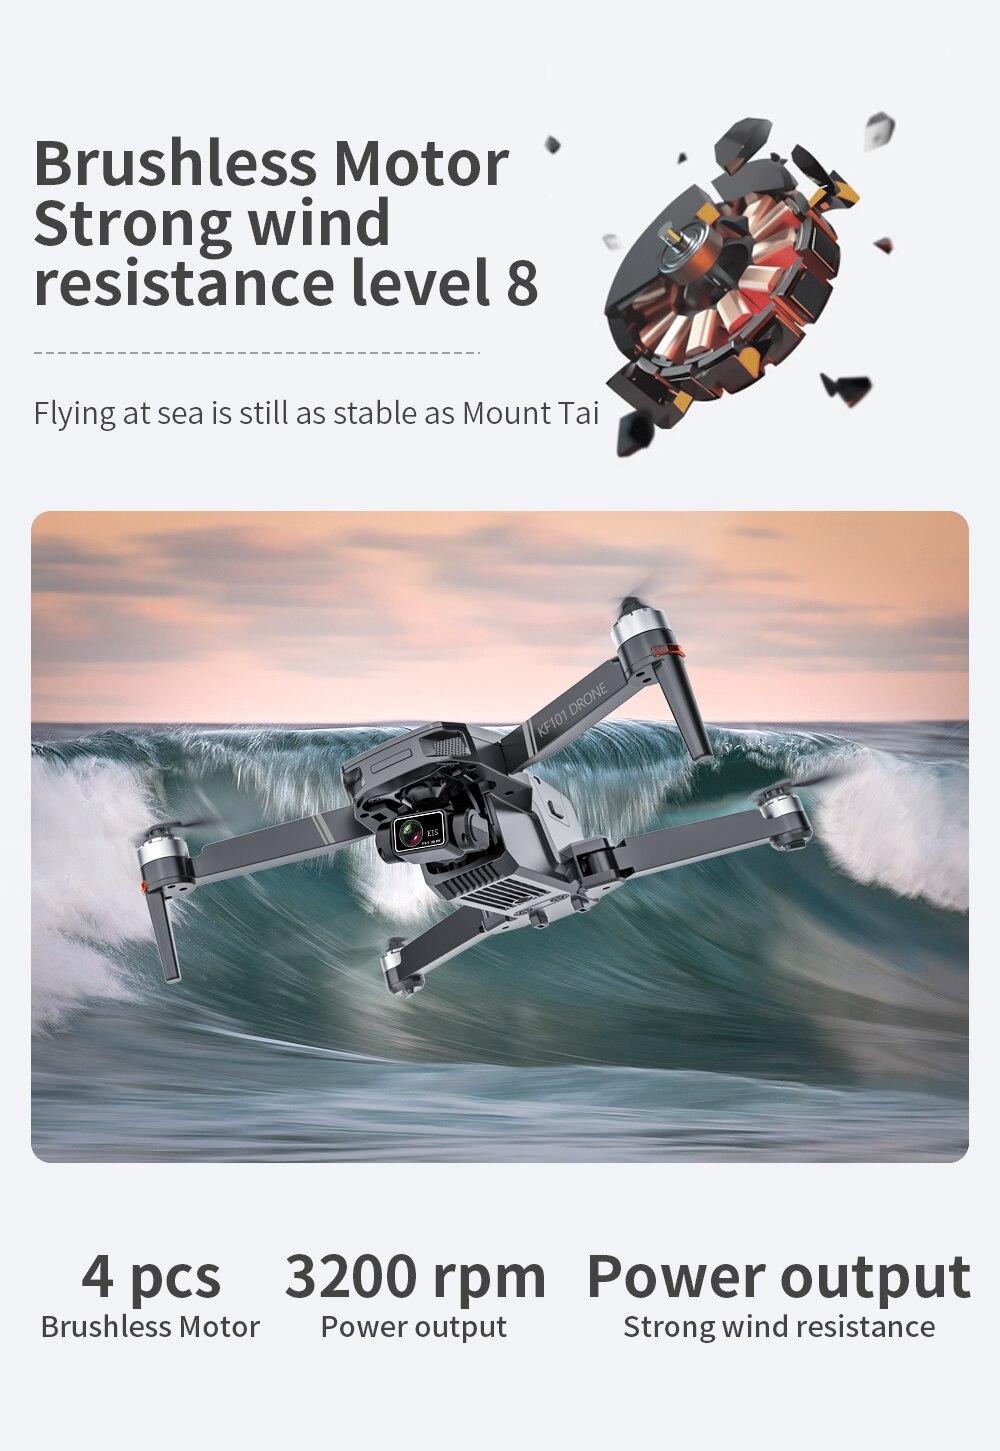 Hf6750db2b8ce4c61a7ecbab871cf84a8b - New KF101 GPS Drone 4K Professional 8K HD EIS Camera Anti-Shake 3-Axis Gimbal 5G Wifi Brushless Motor RC Foldable Quadcopter